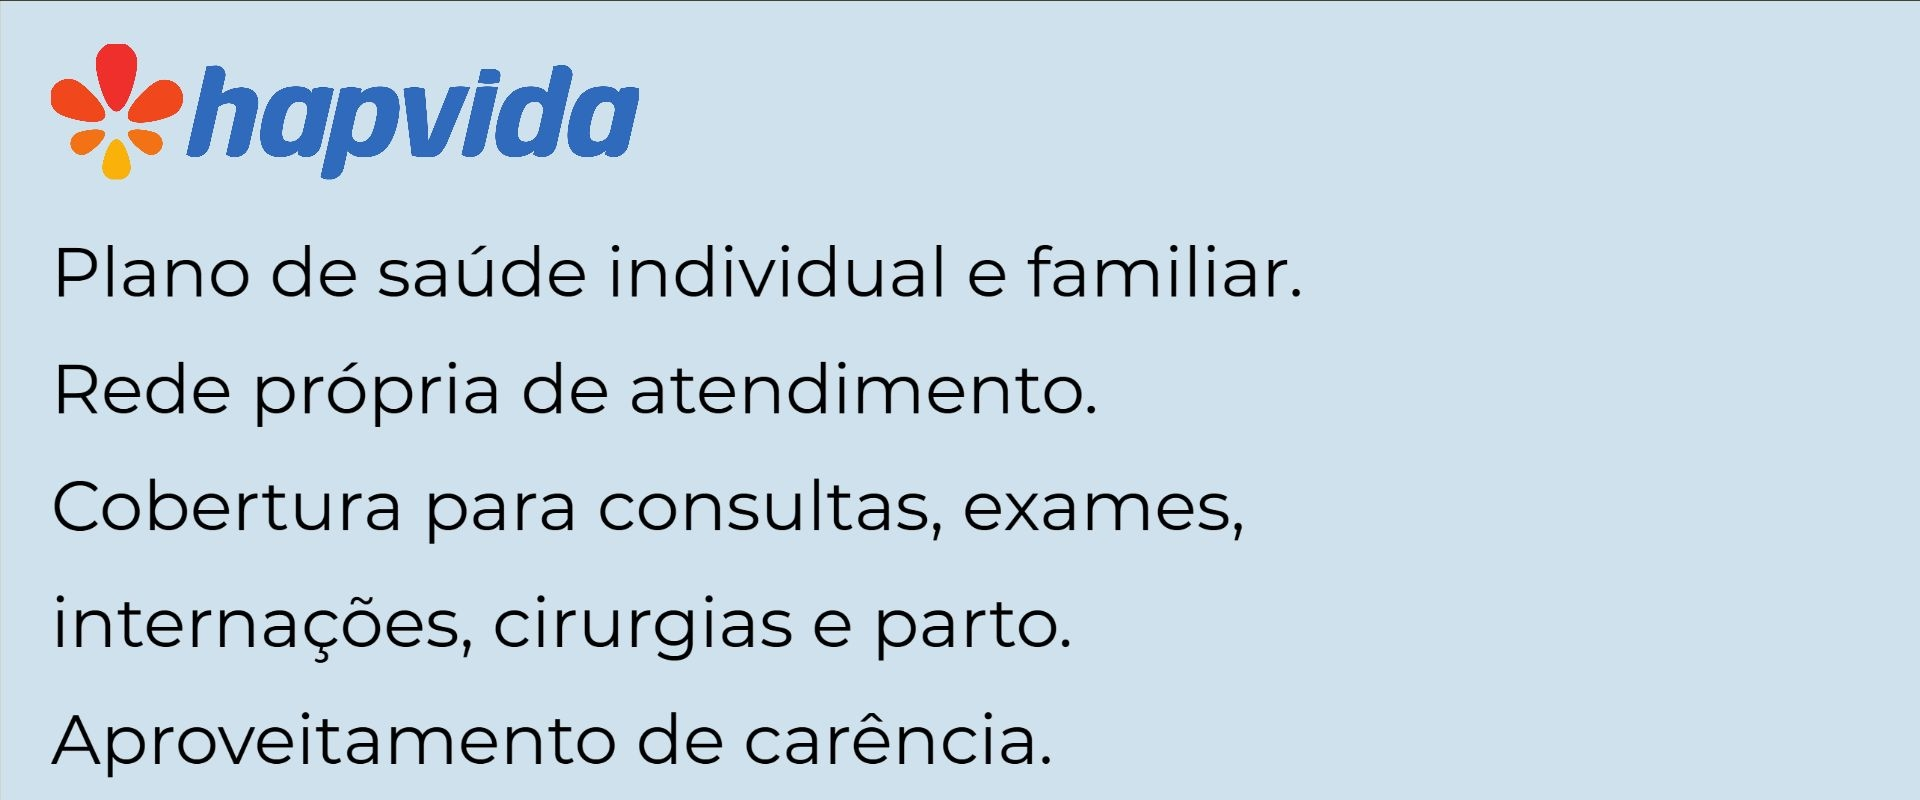 Hapvida Individual e Familiar - Salvador-BA